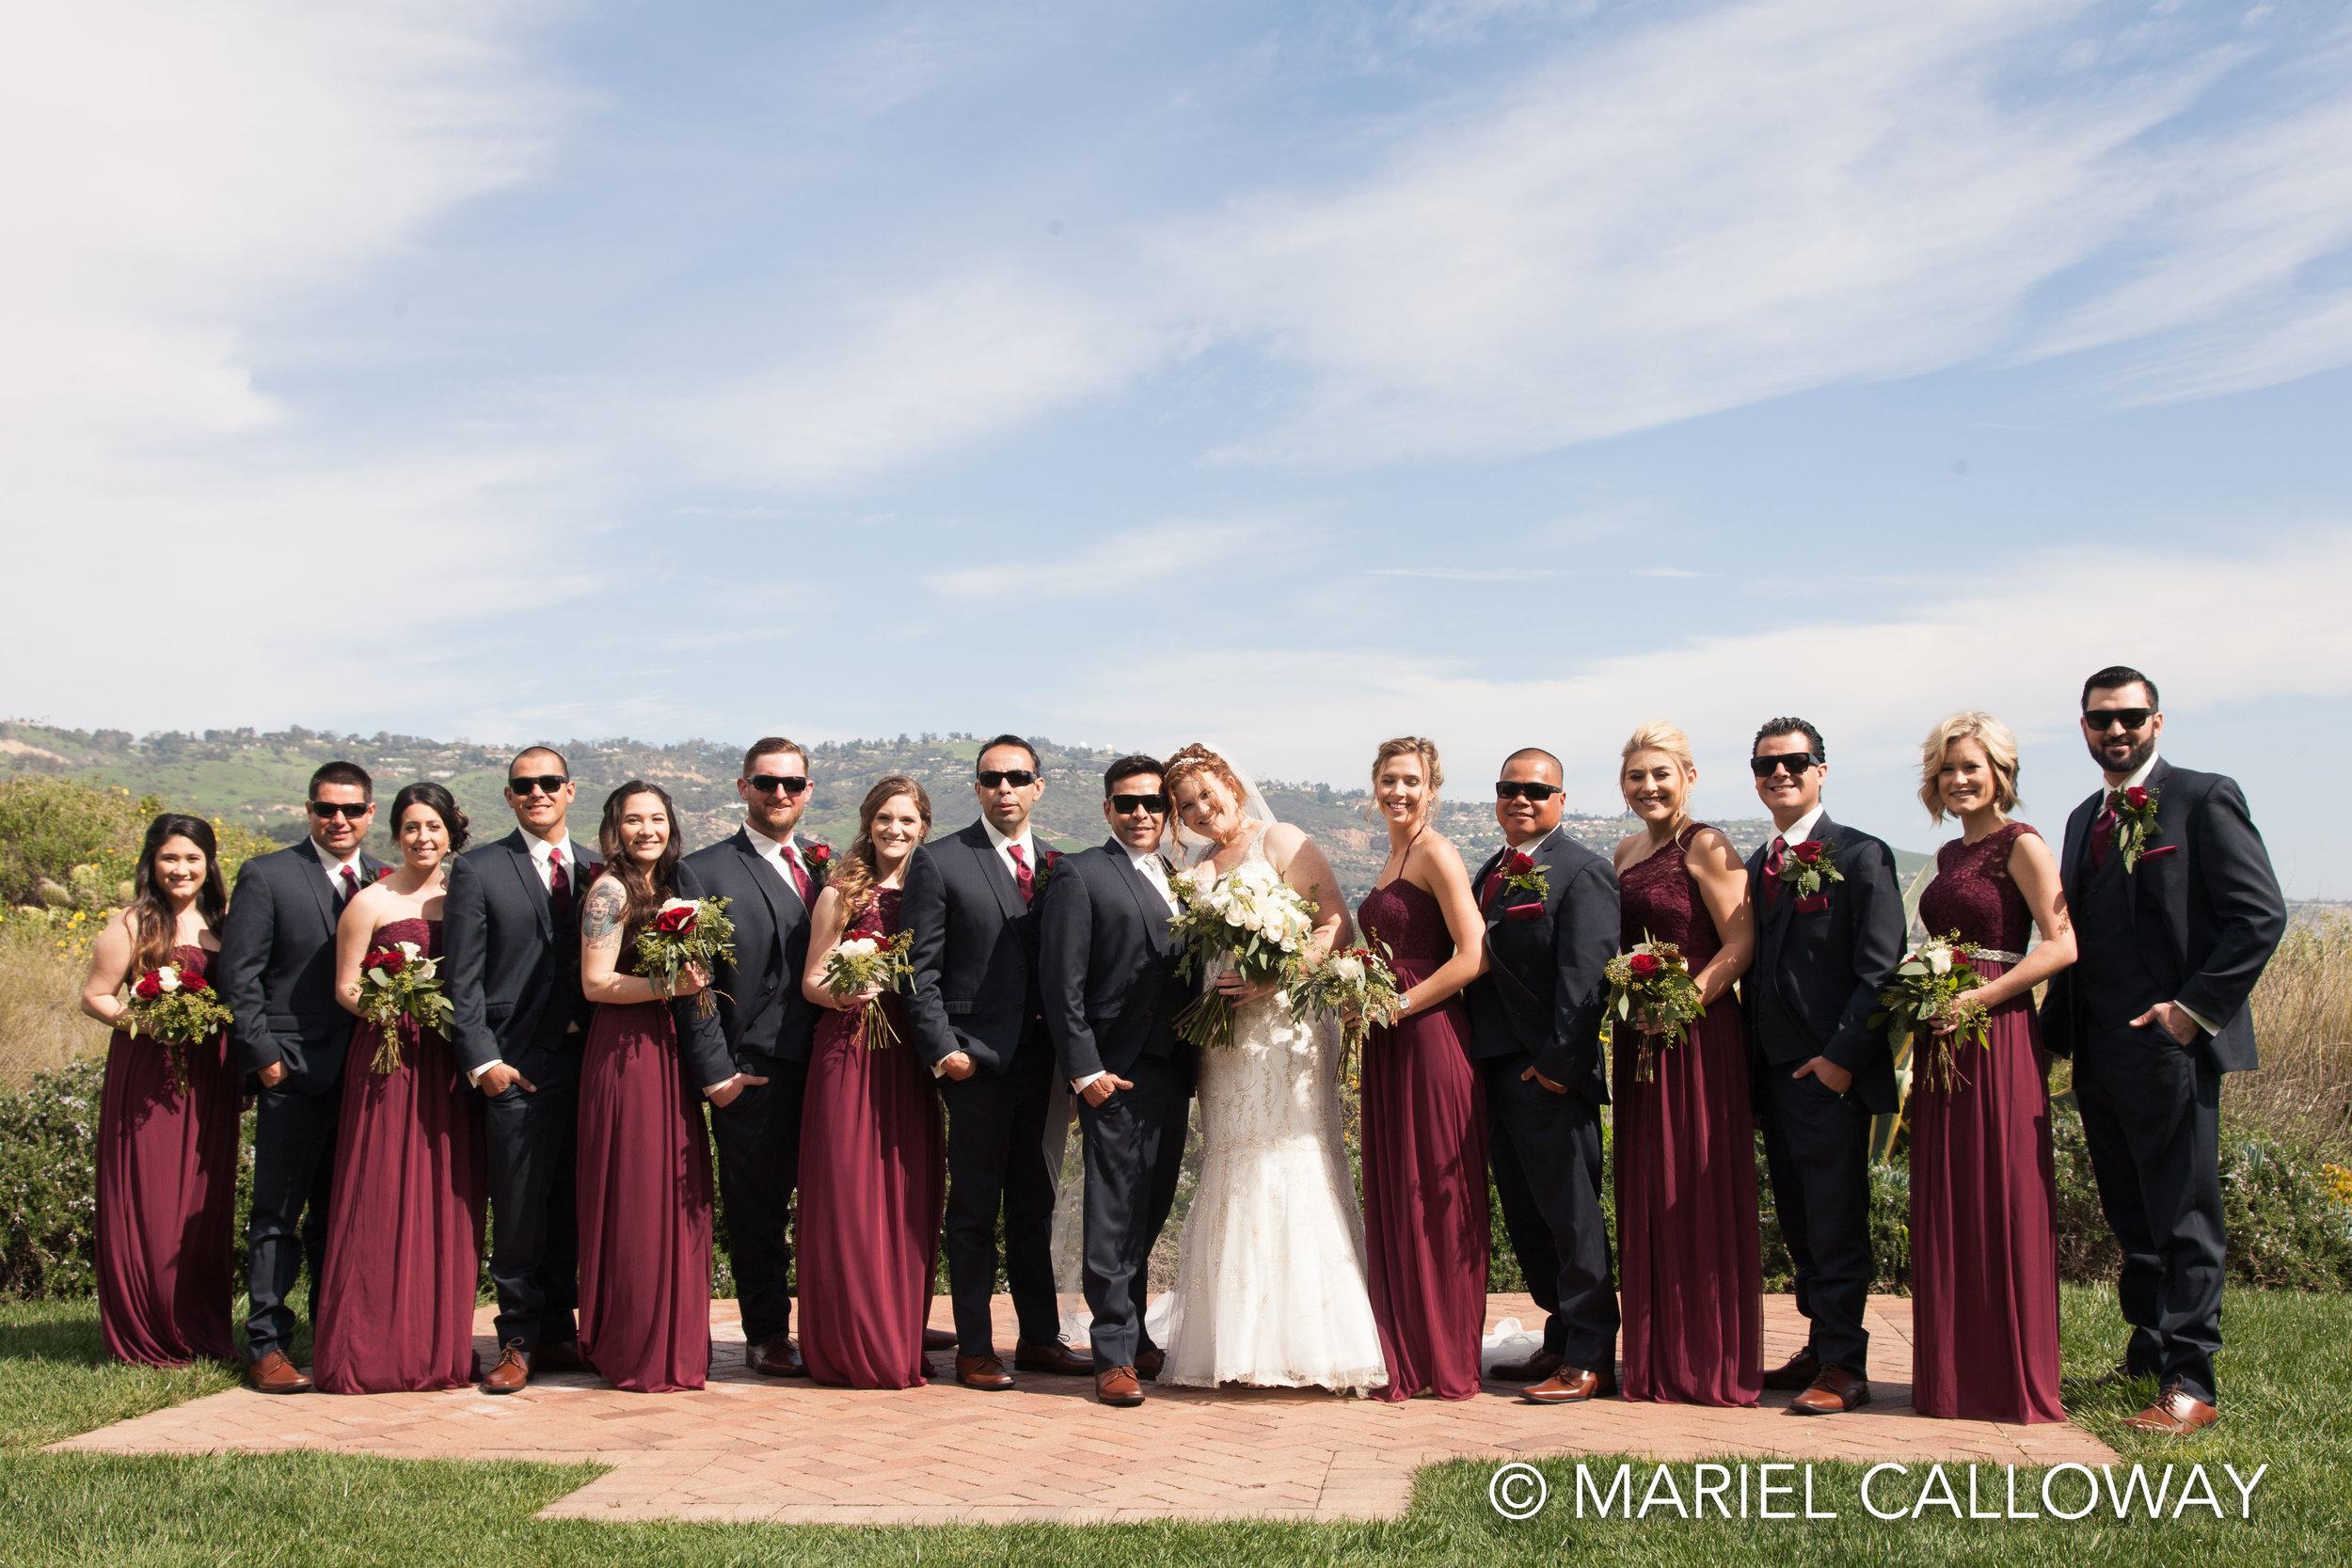 Mariel-Calloway-Los-Angeles-Wedding-Photography-Carmona-7.jpg